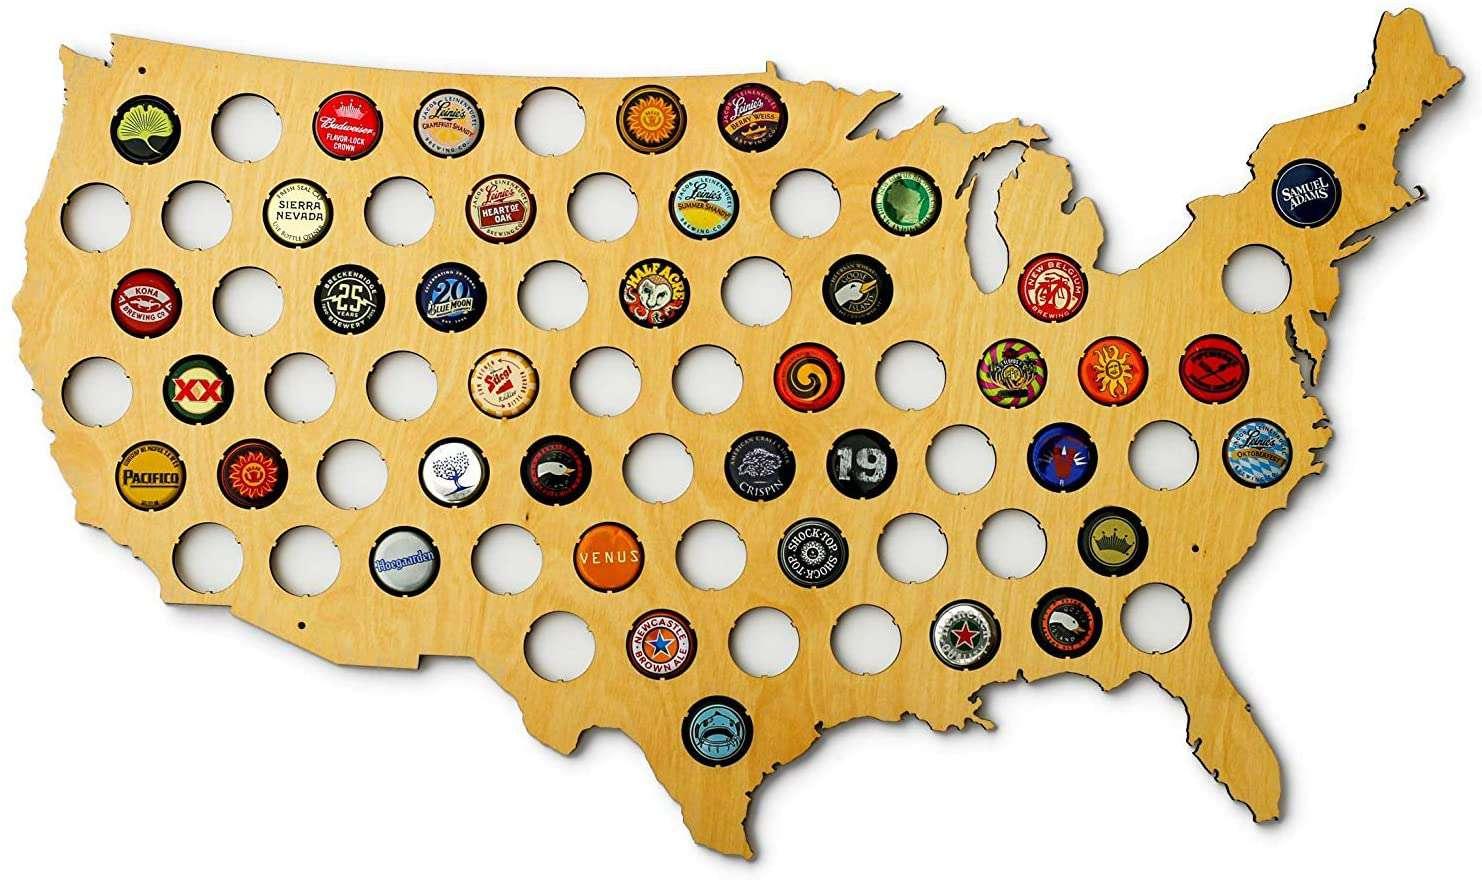 Skyline Workshop United States of America Beer Cap Map